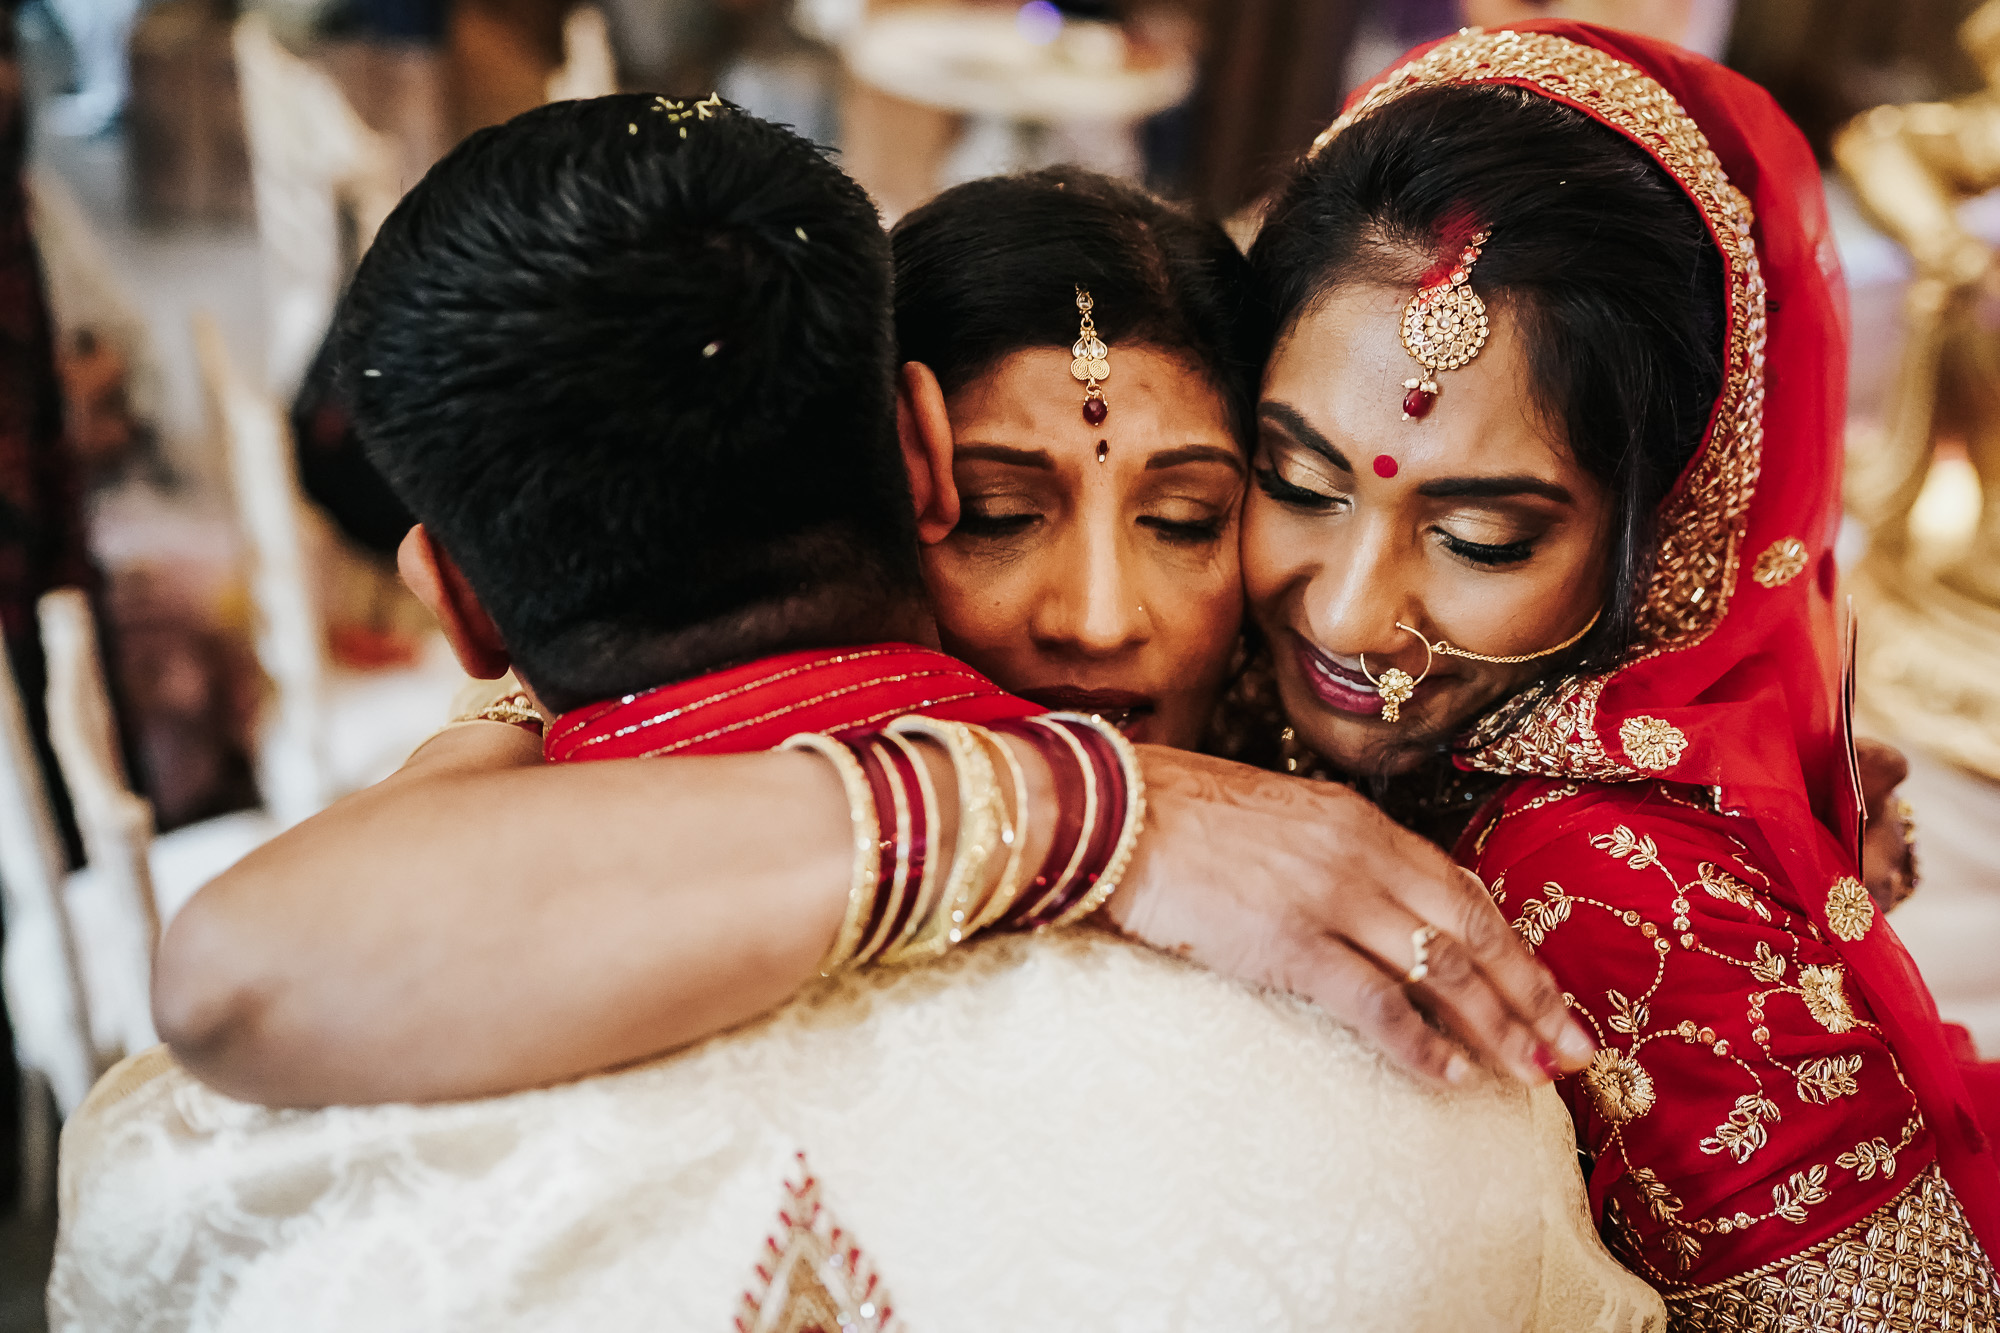 Alcumlow Hall Farm Indian Wedding Photographer (19 of 44).jpg